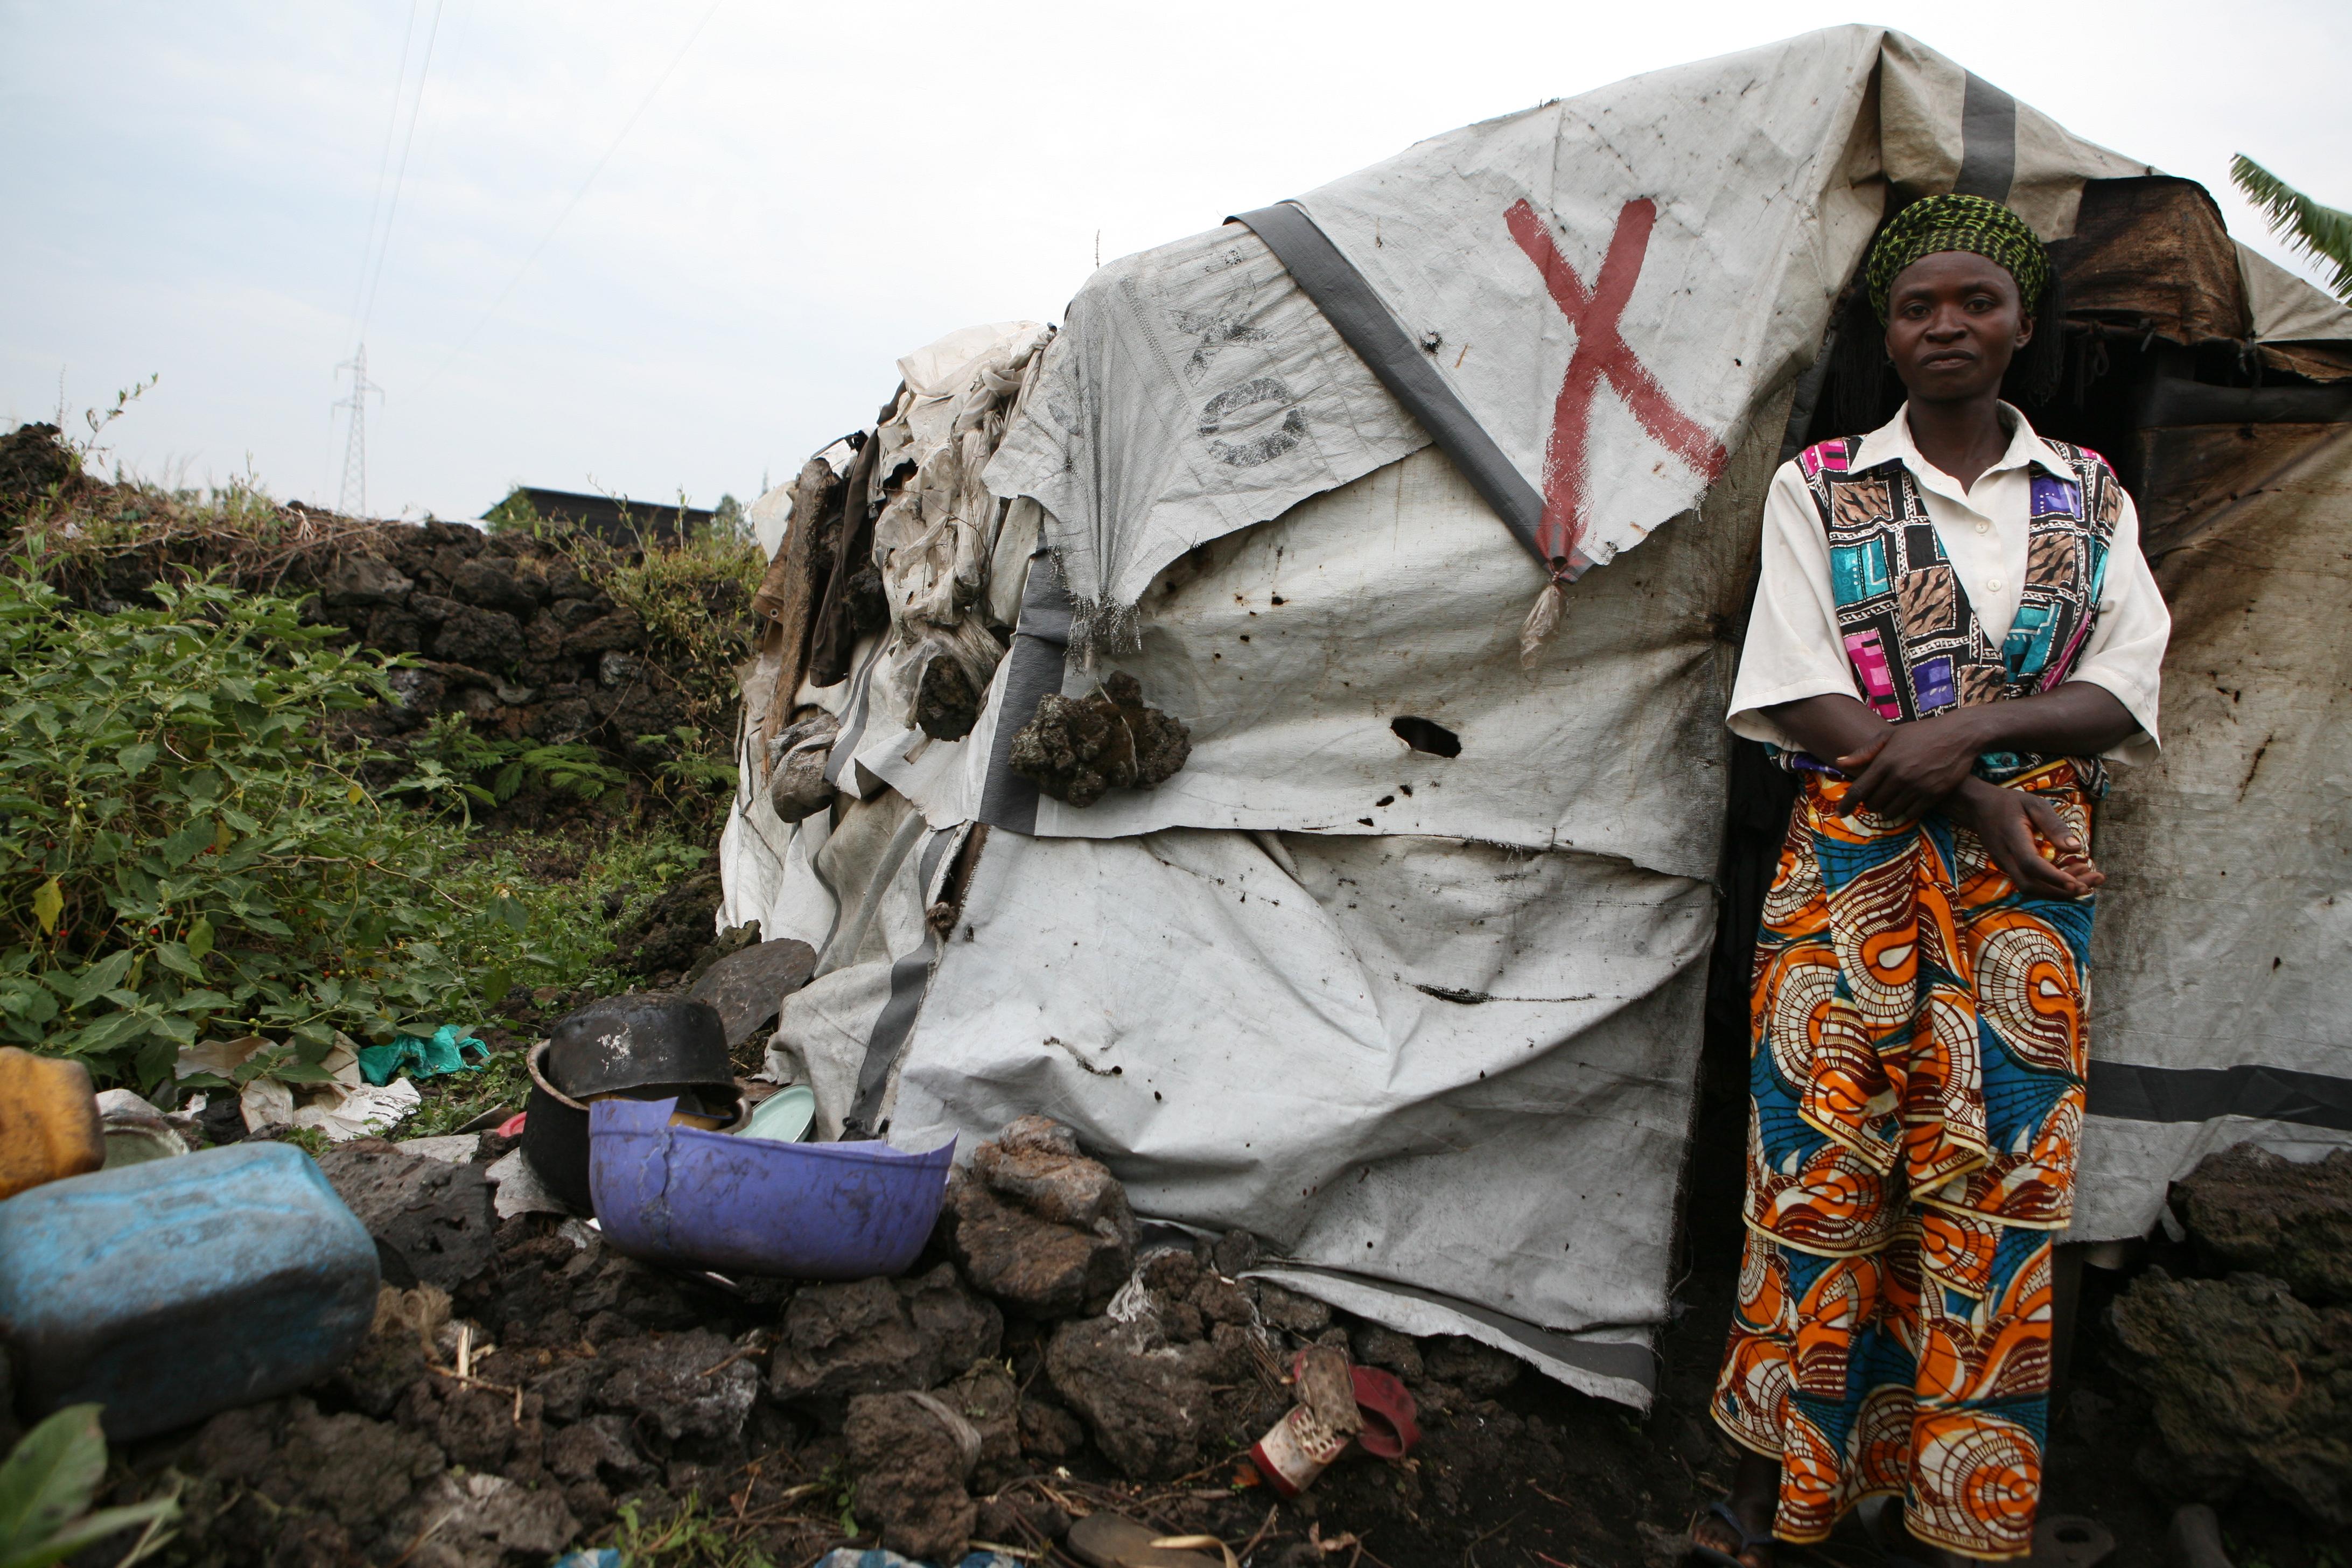 The Bambuti settlement in Mugunga lacks the most basic amenities. Photo: Zahra Moloo/IRIN